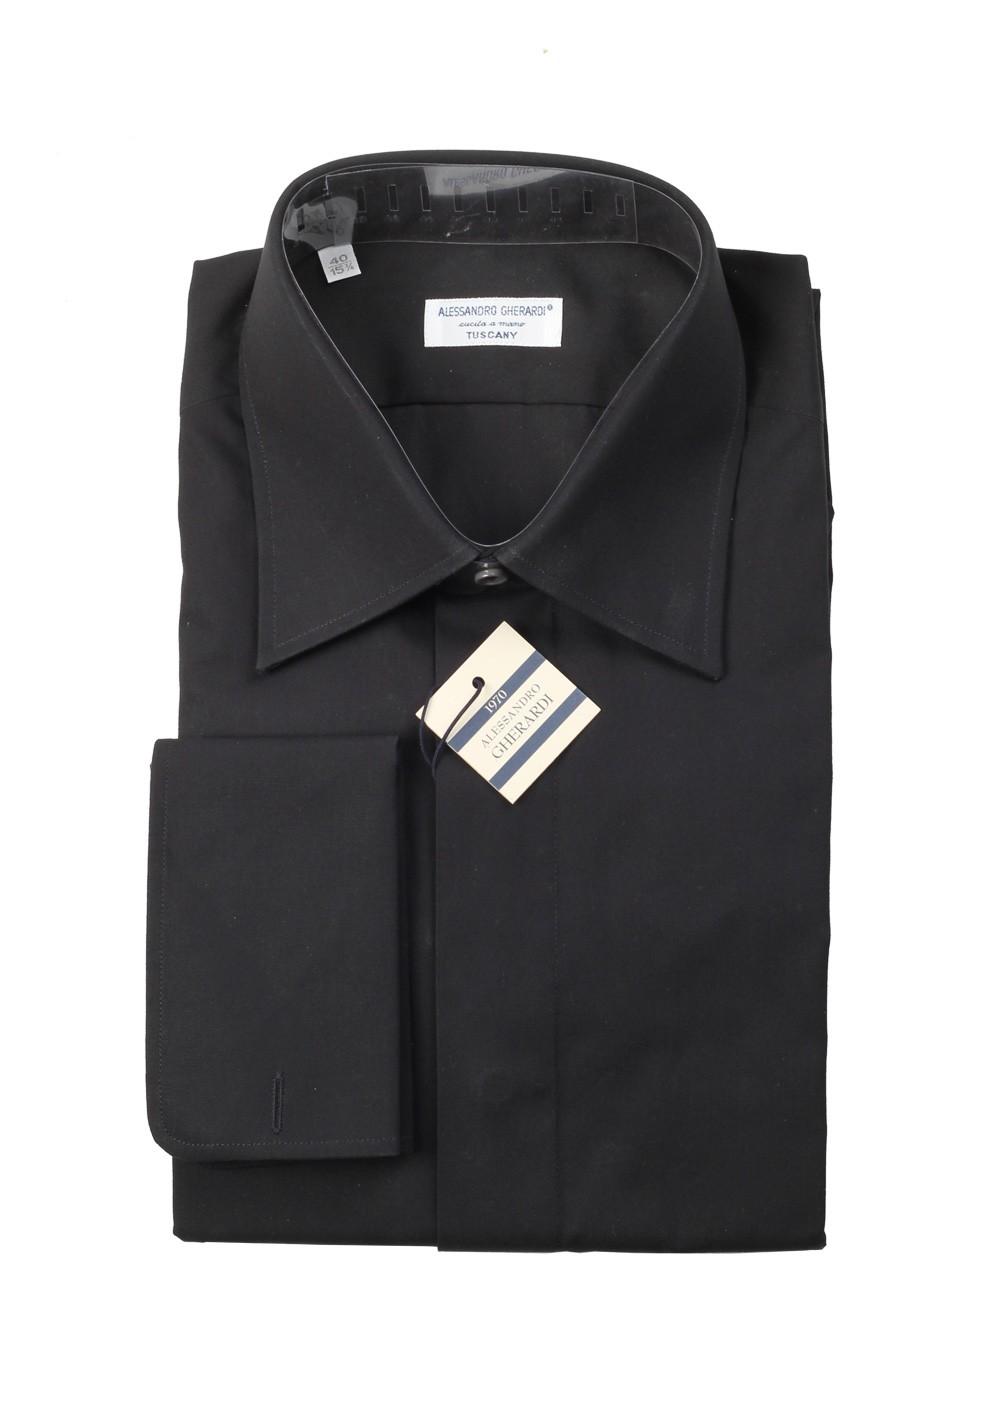 Alessandro Gherardi Shirt Tuxedo Dress Size 40 / 16 U.S. | Costume Limité